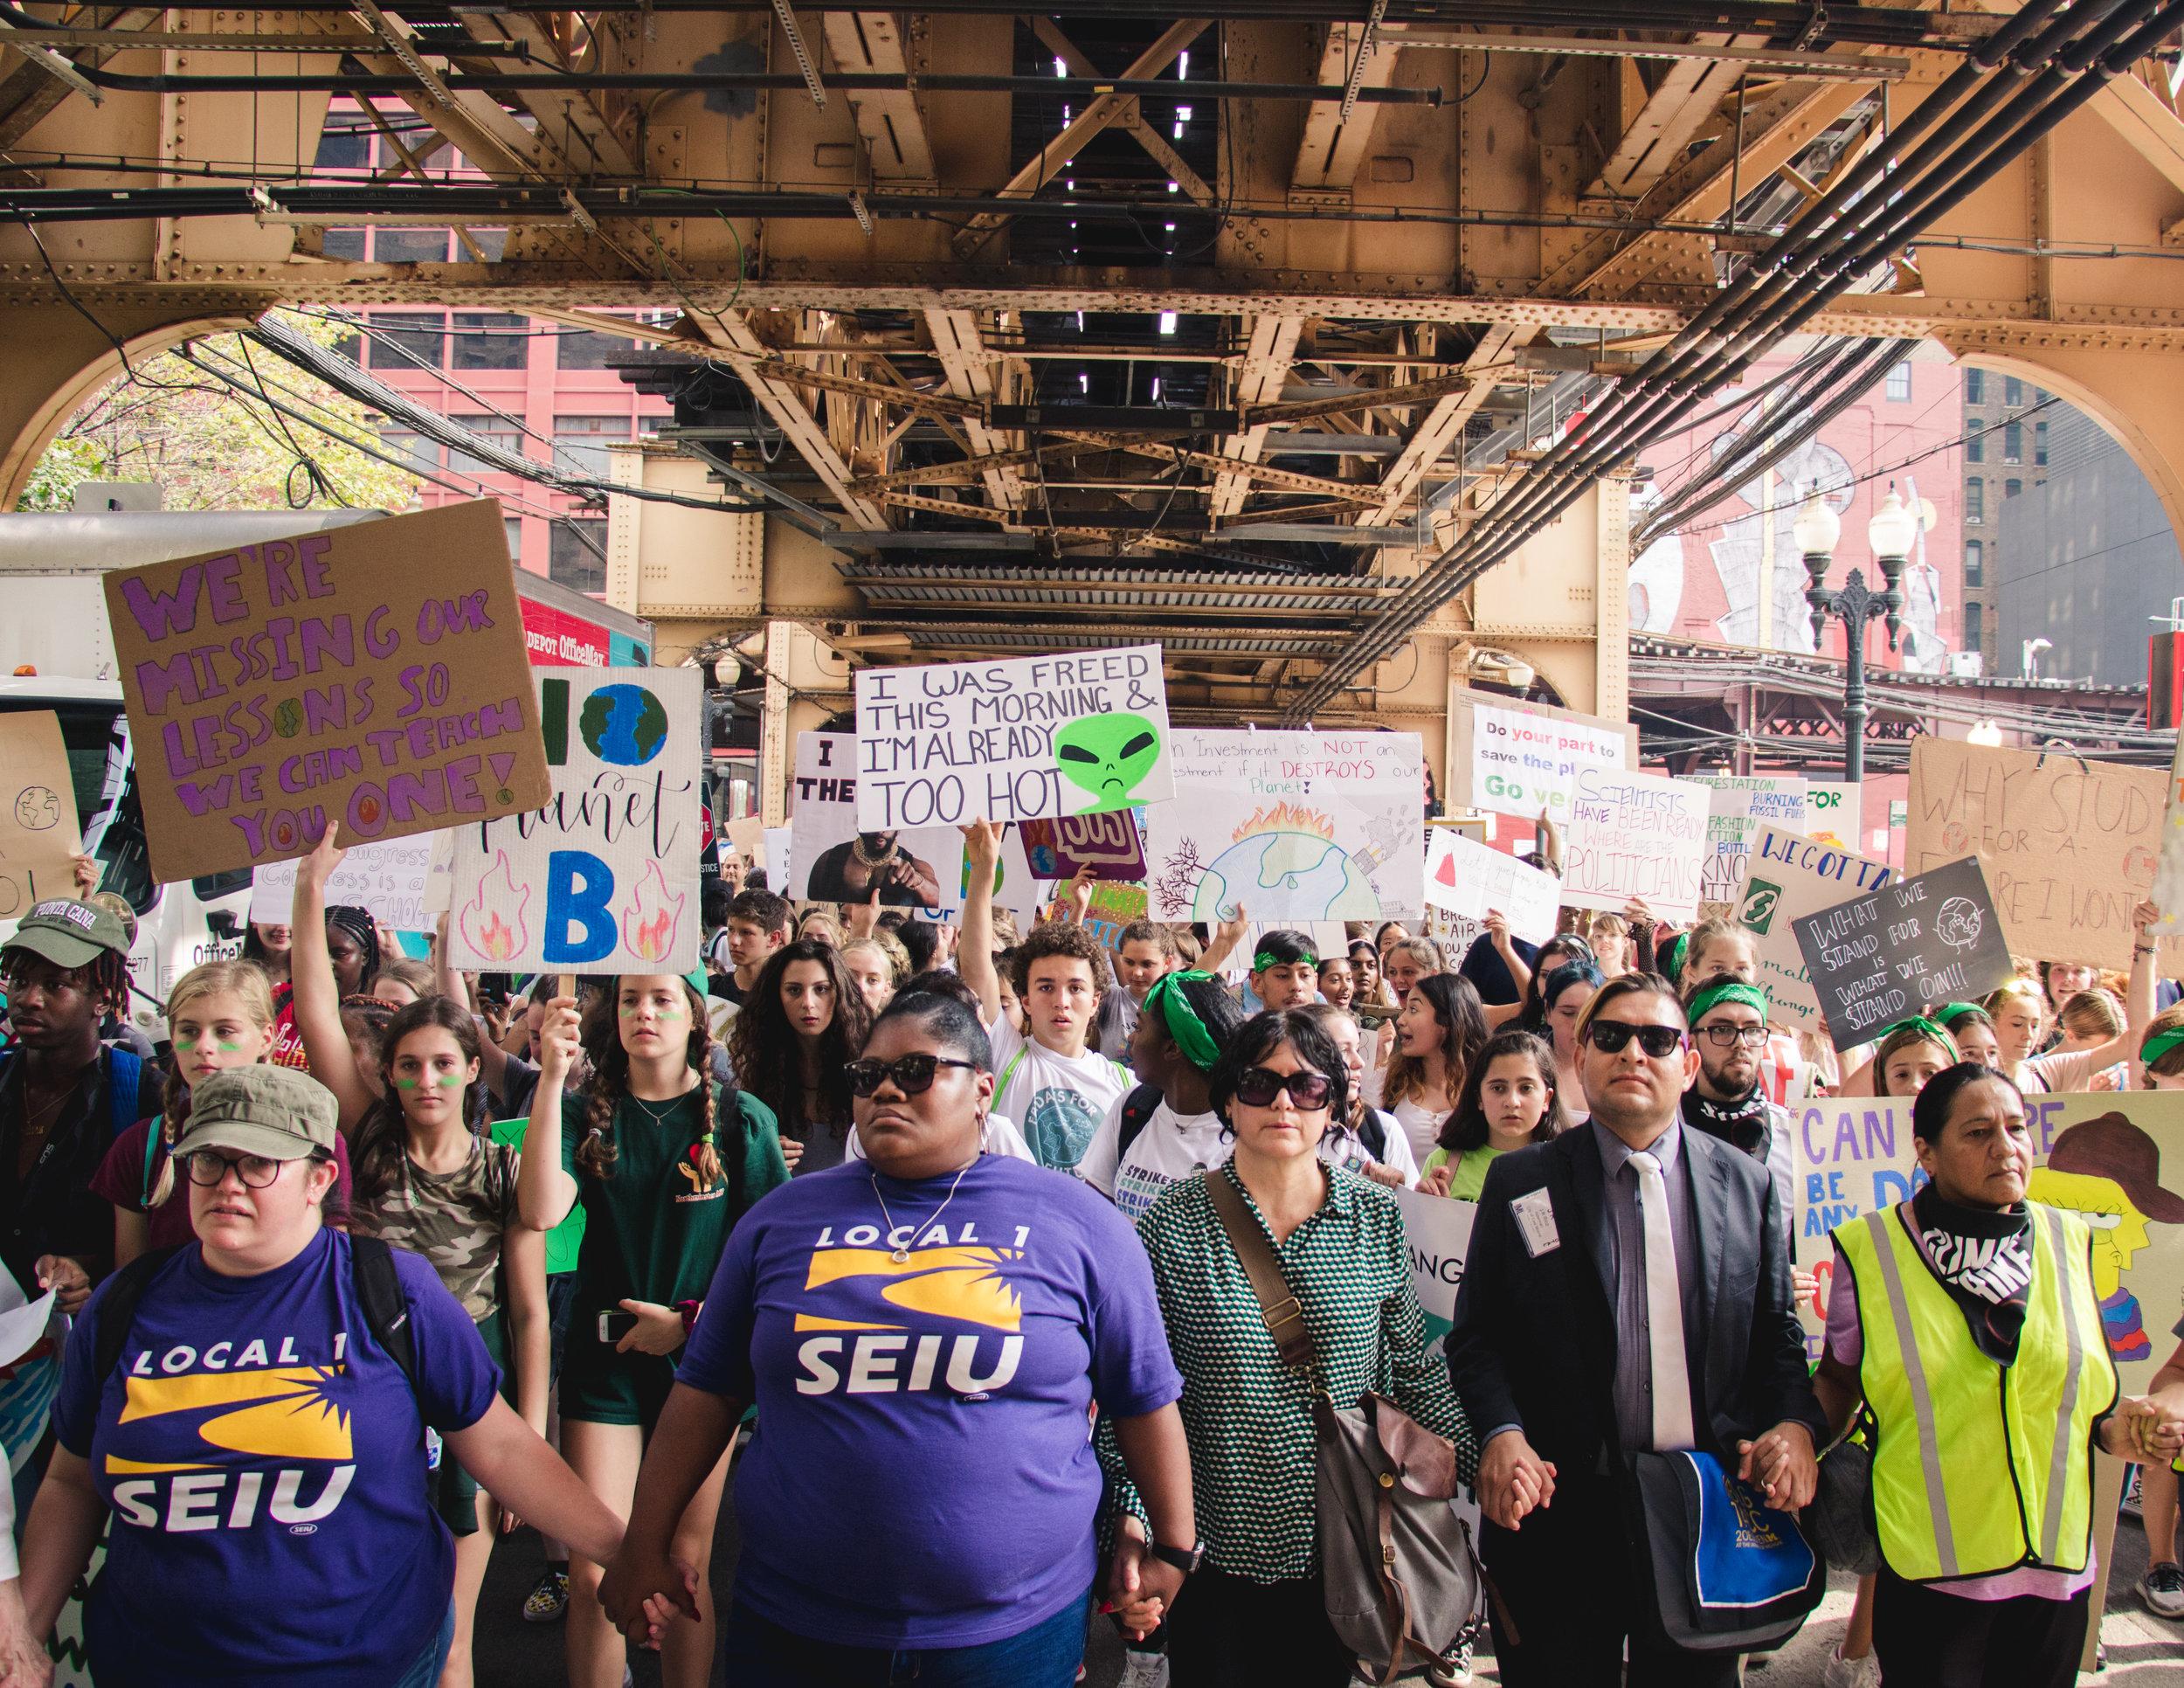 Organizers walking underneath the city's raised train tracks.